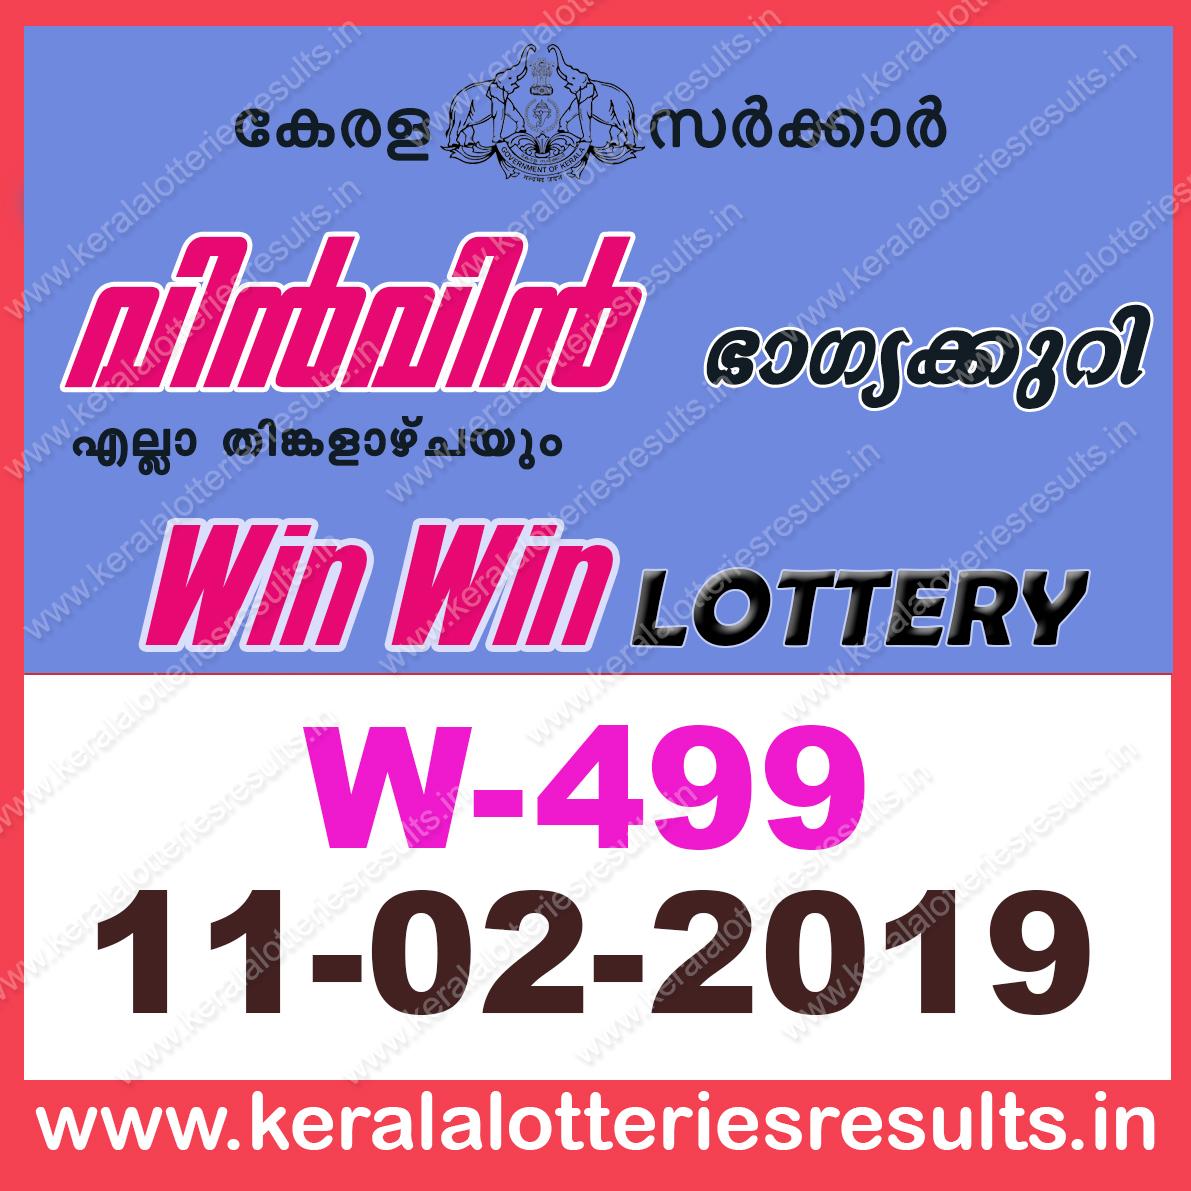 Kerala Lottery Results 15 02 2019 Nirmal NR-108 Result Today